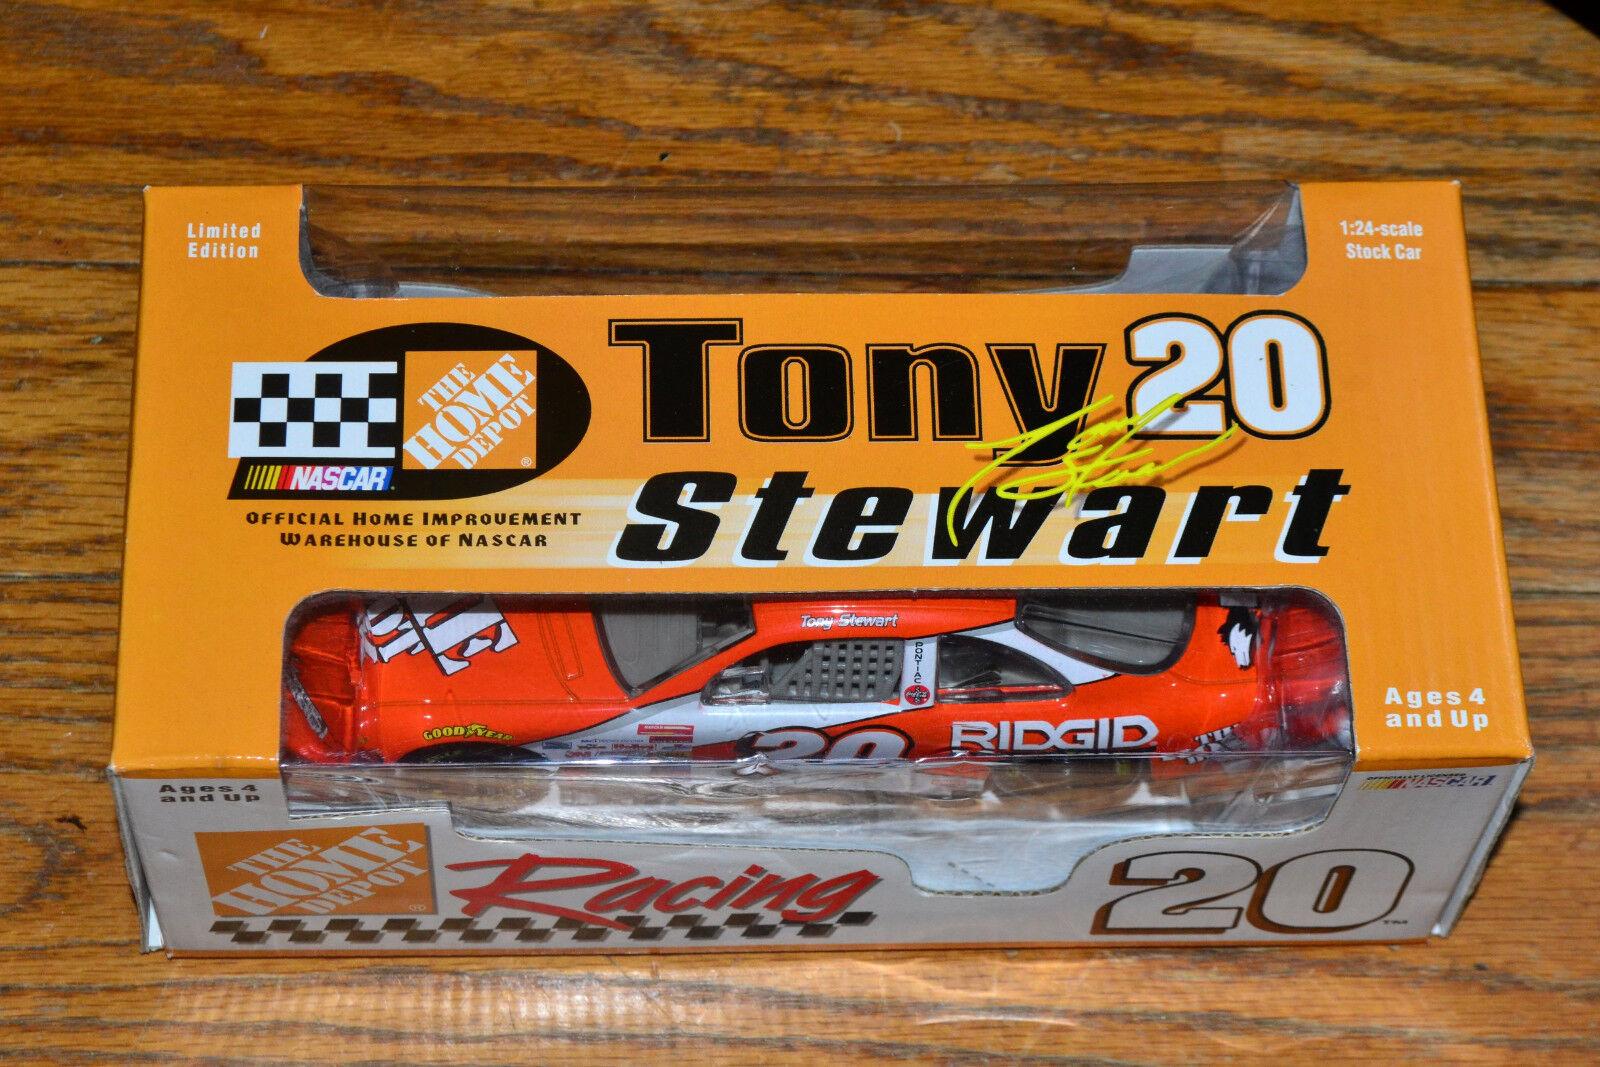 NASCAR 1 24 1999 Action Tony Stewart orange Home Depot Racing Pontiac